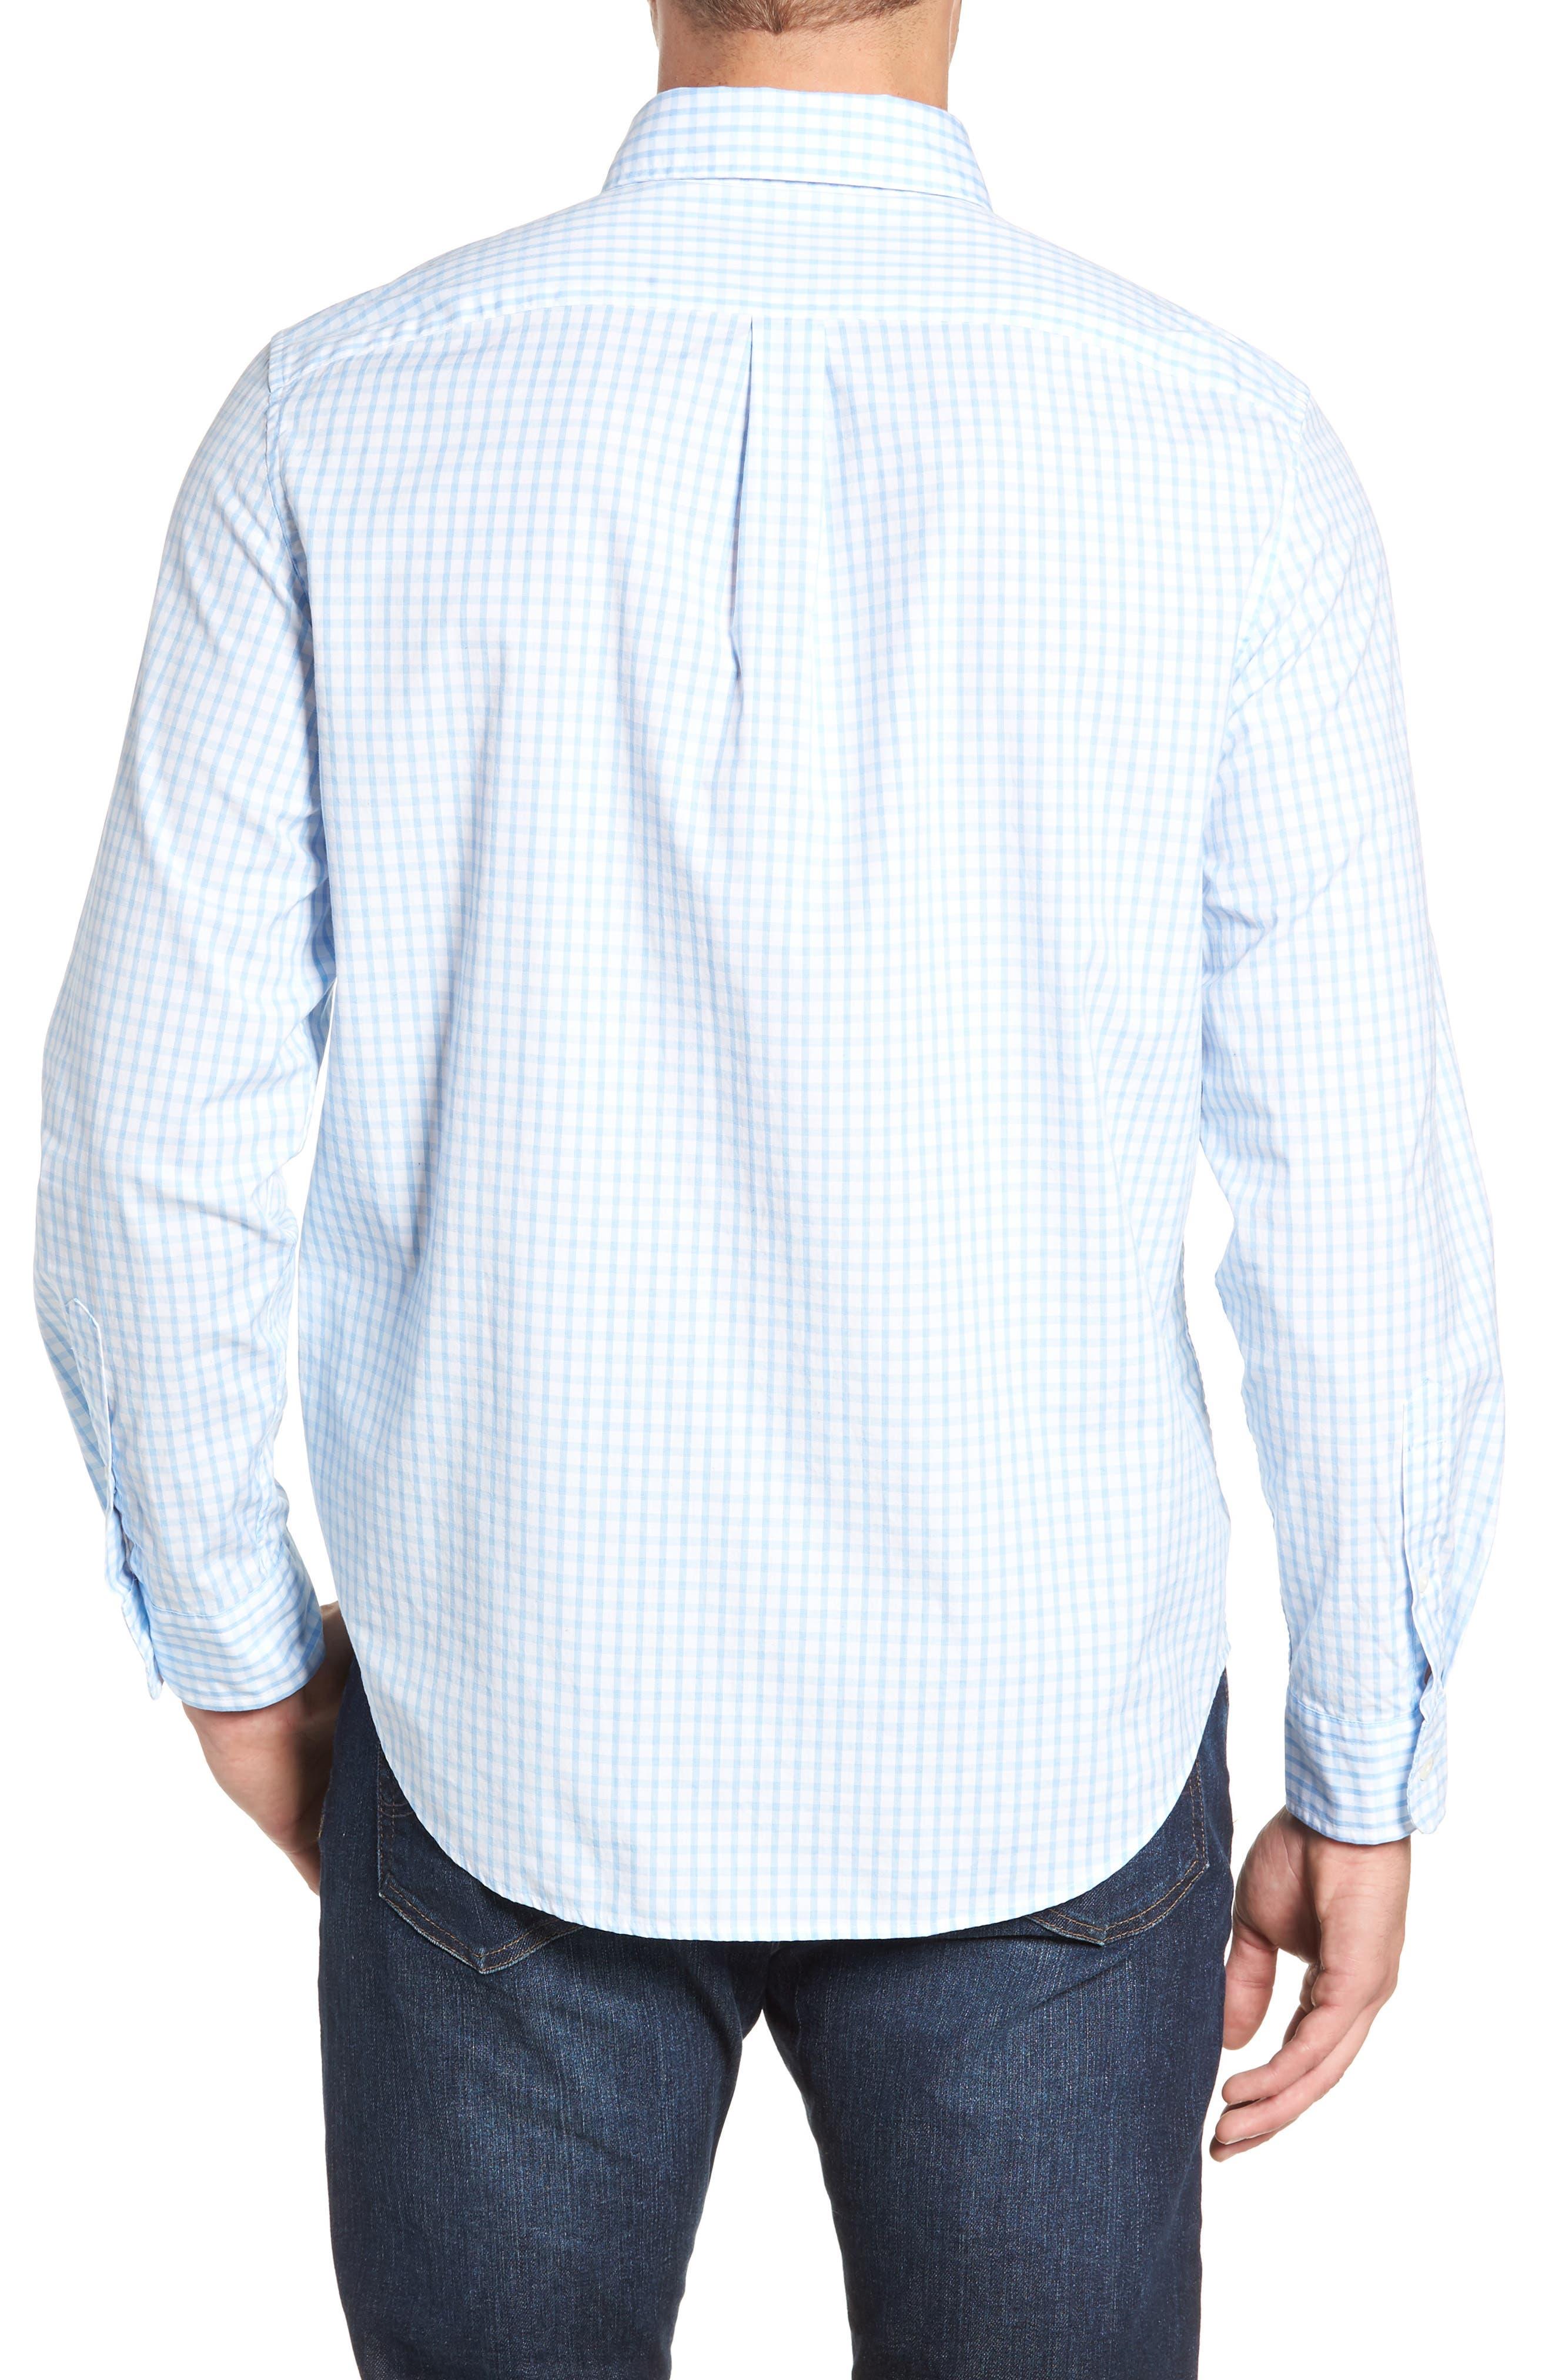 VINEYARD VINES, Micro Graph Classic Fit Check Sport Shirt, Alternate thumbnail 3, color, OCEAN BREEZE